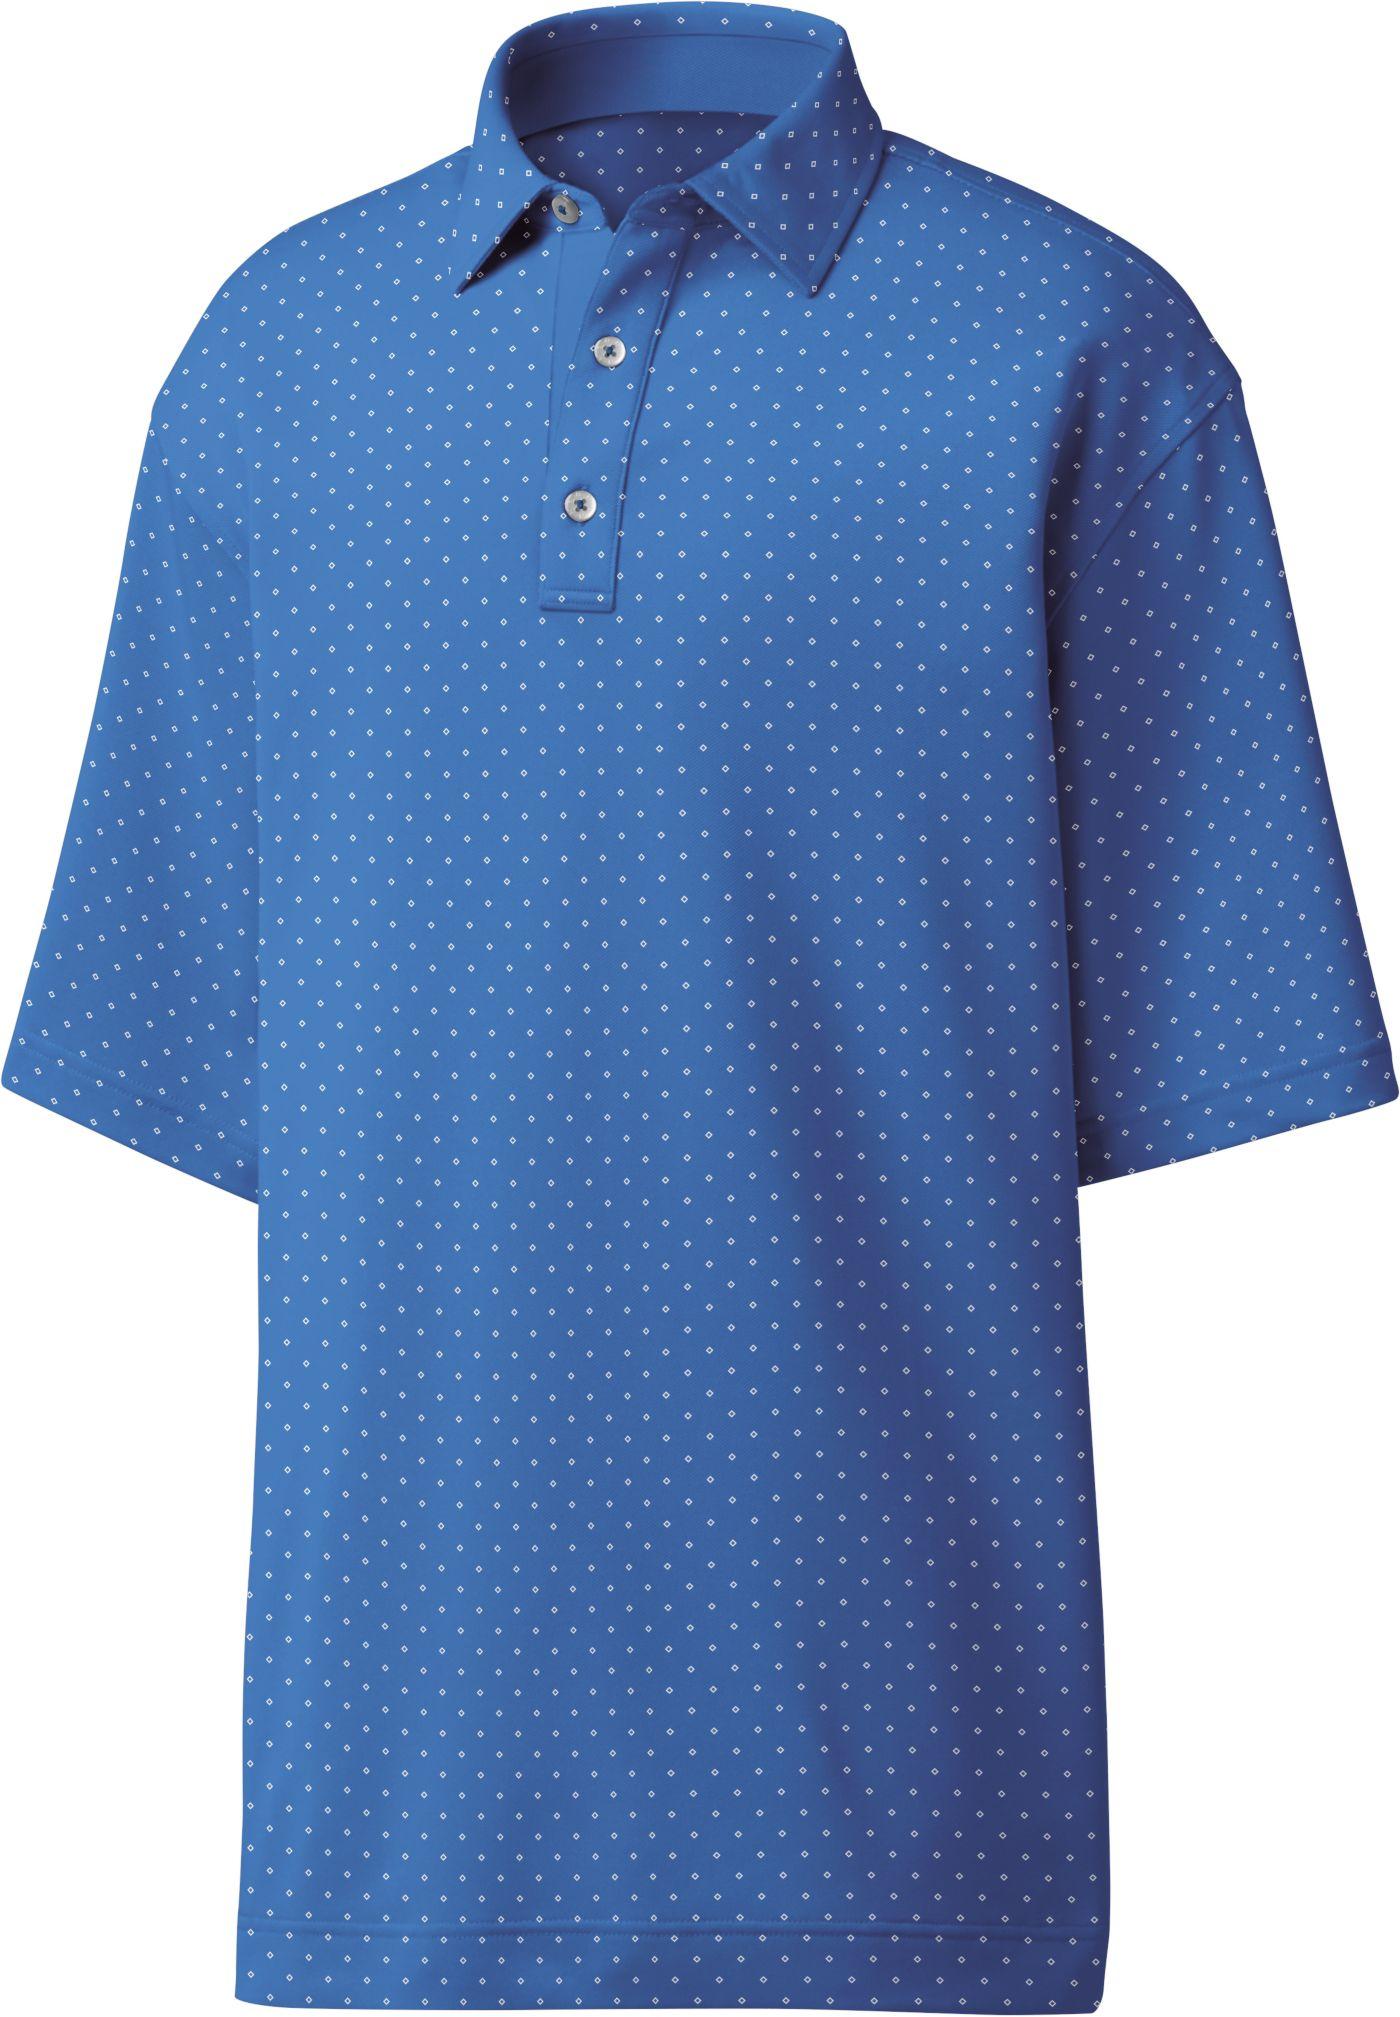 FootJoy Men's Lisle Diamond Print Golf Polo